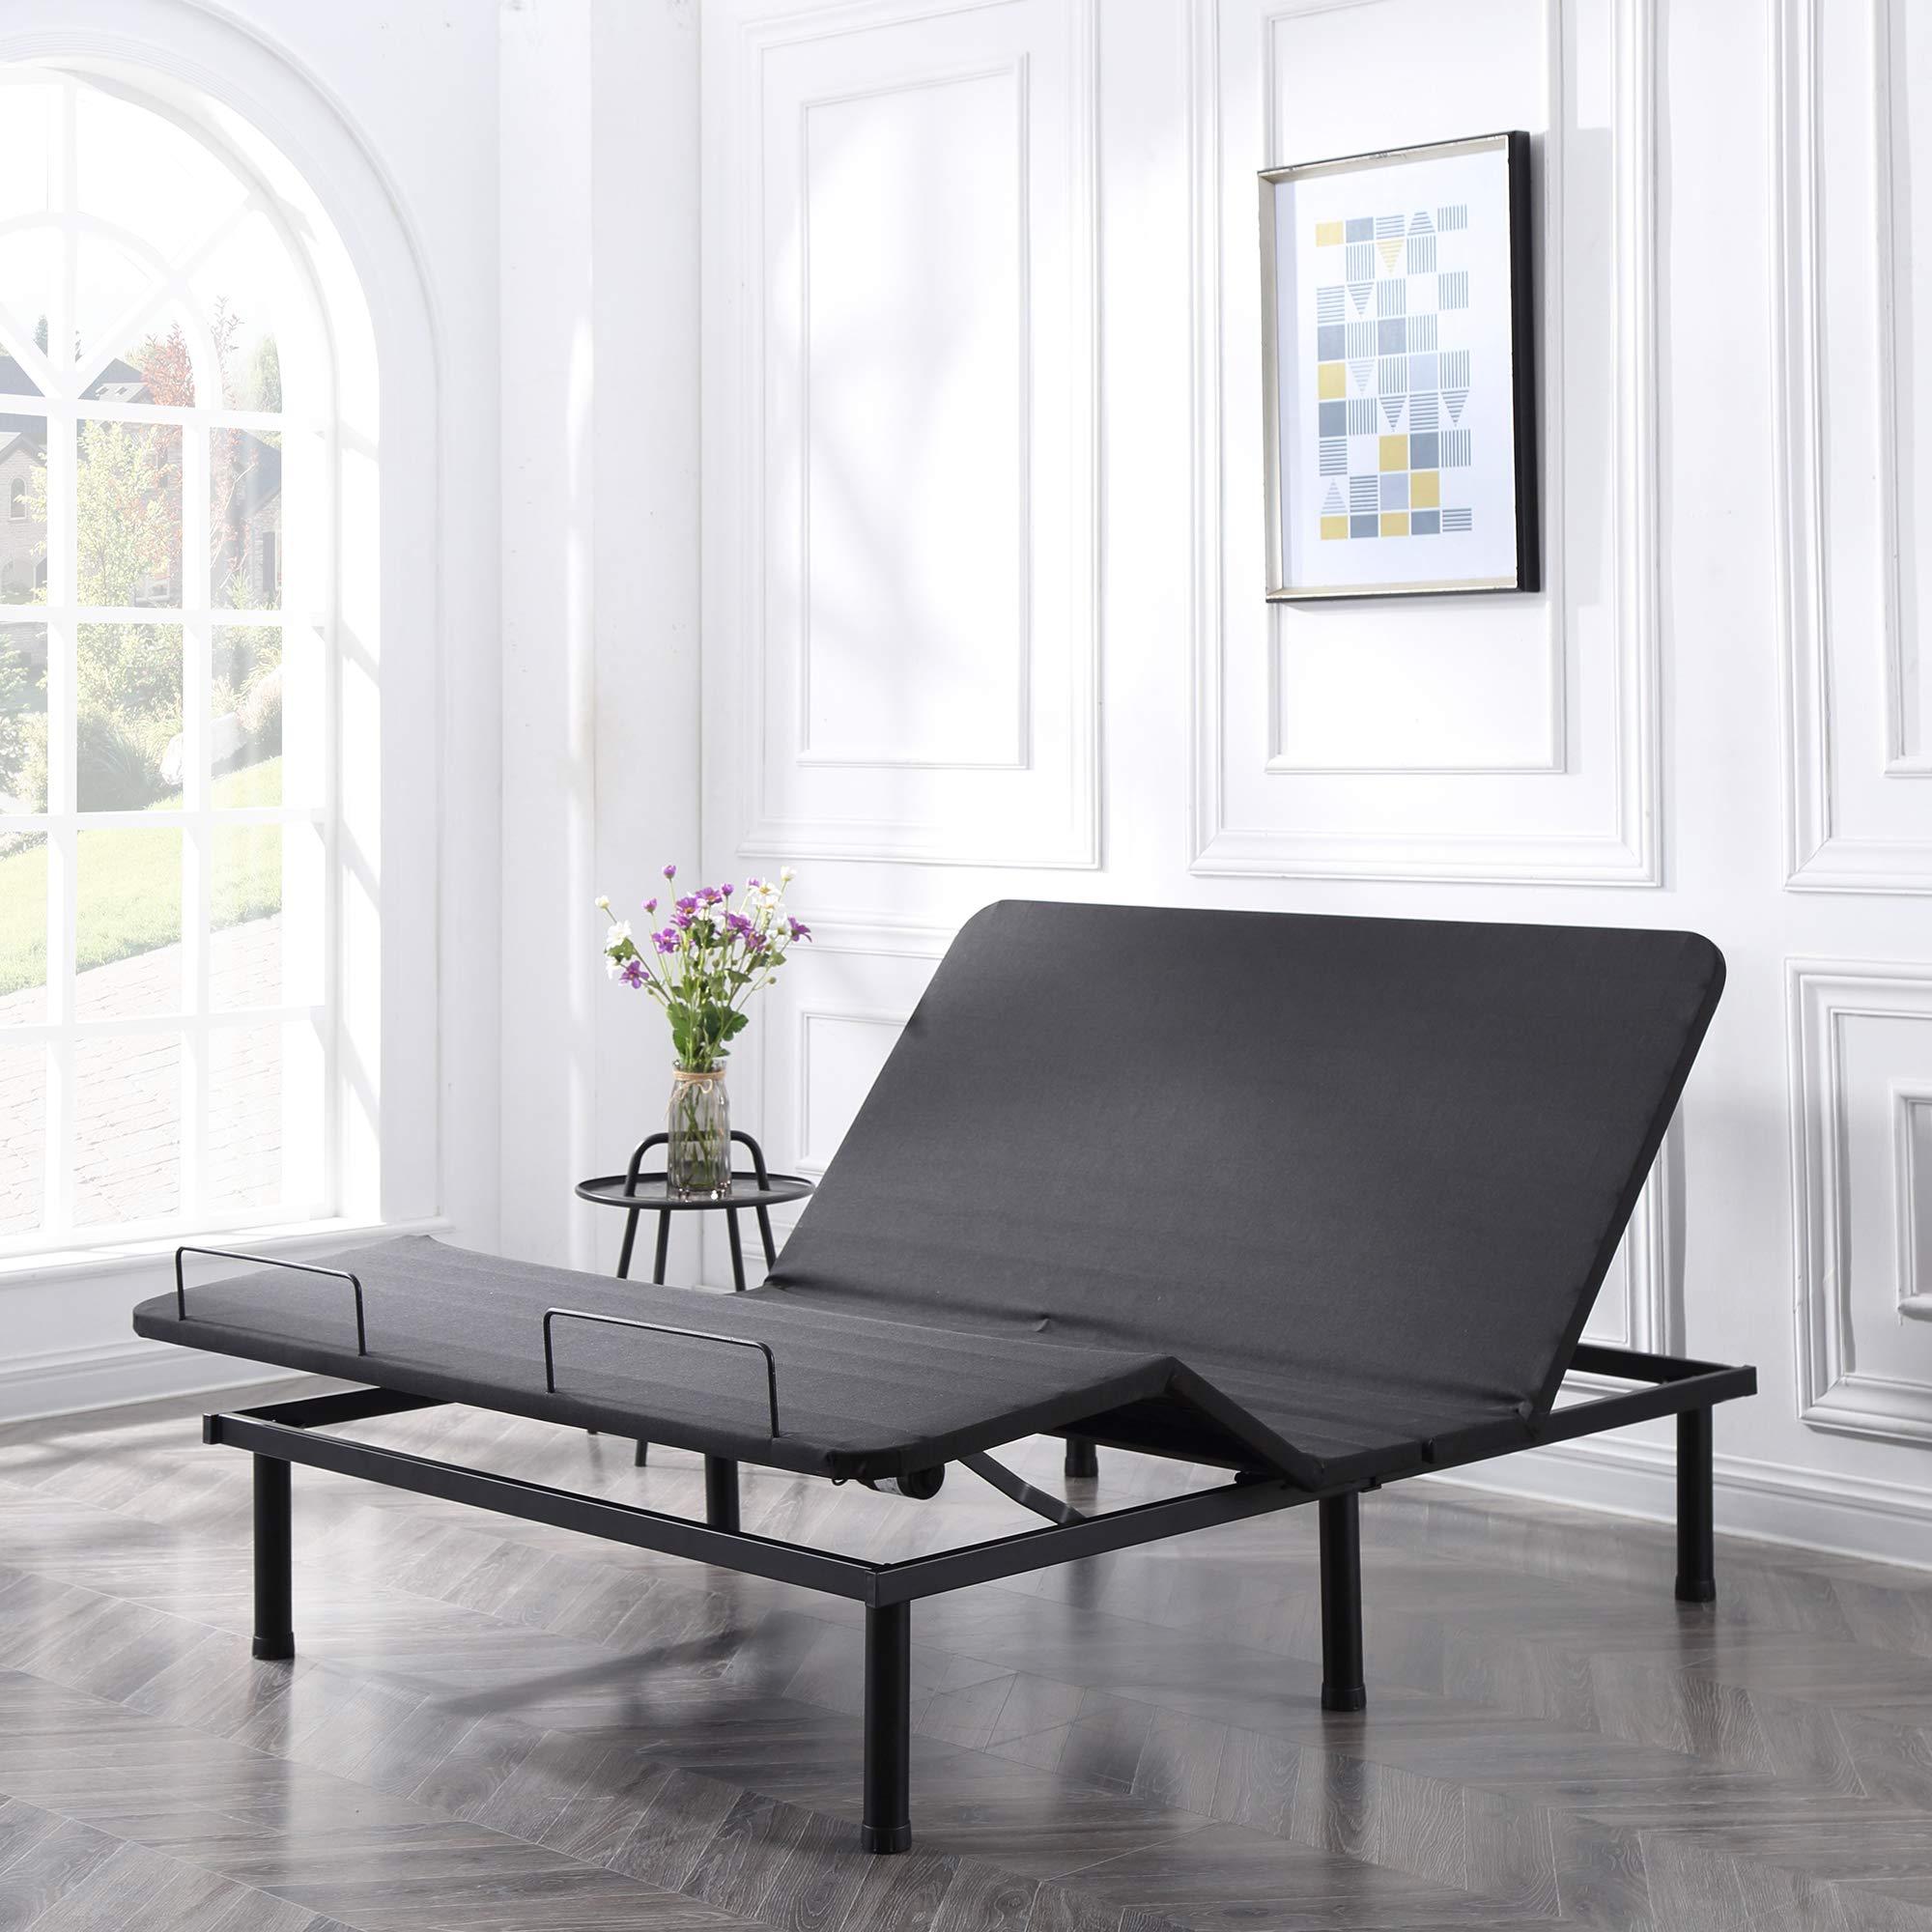 Classic Brands Adjustable Comfort Affordamatic